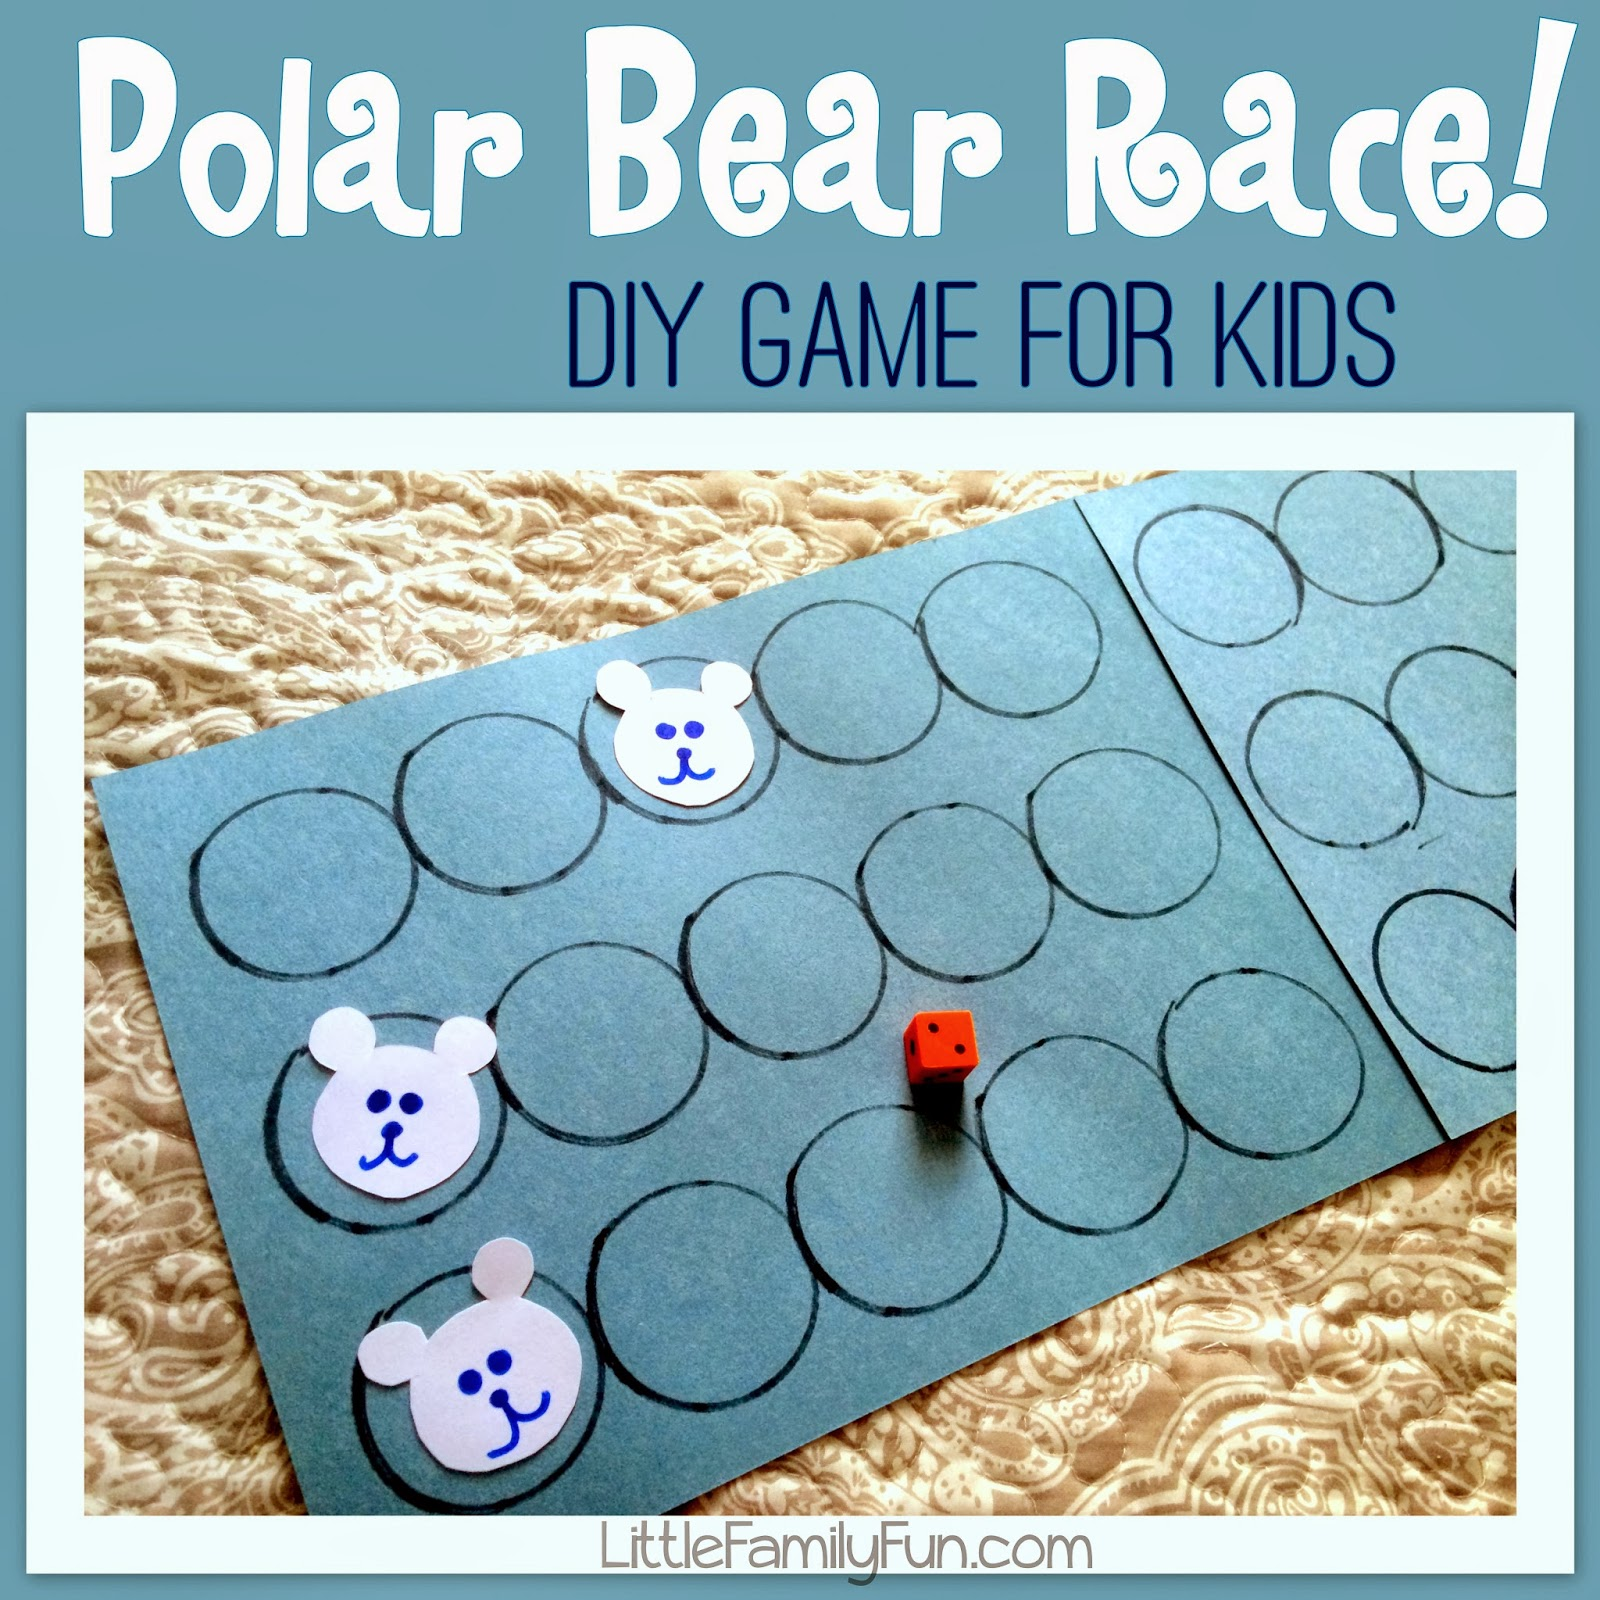 Little Family Fun Polar Bear Race Game